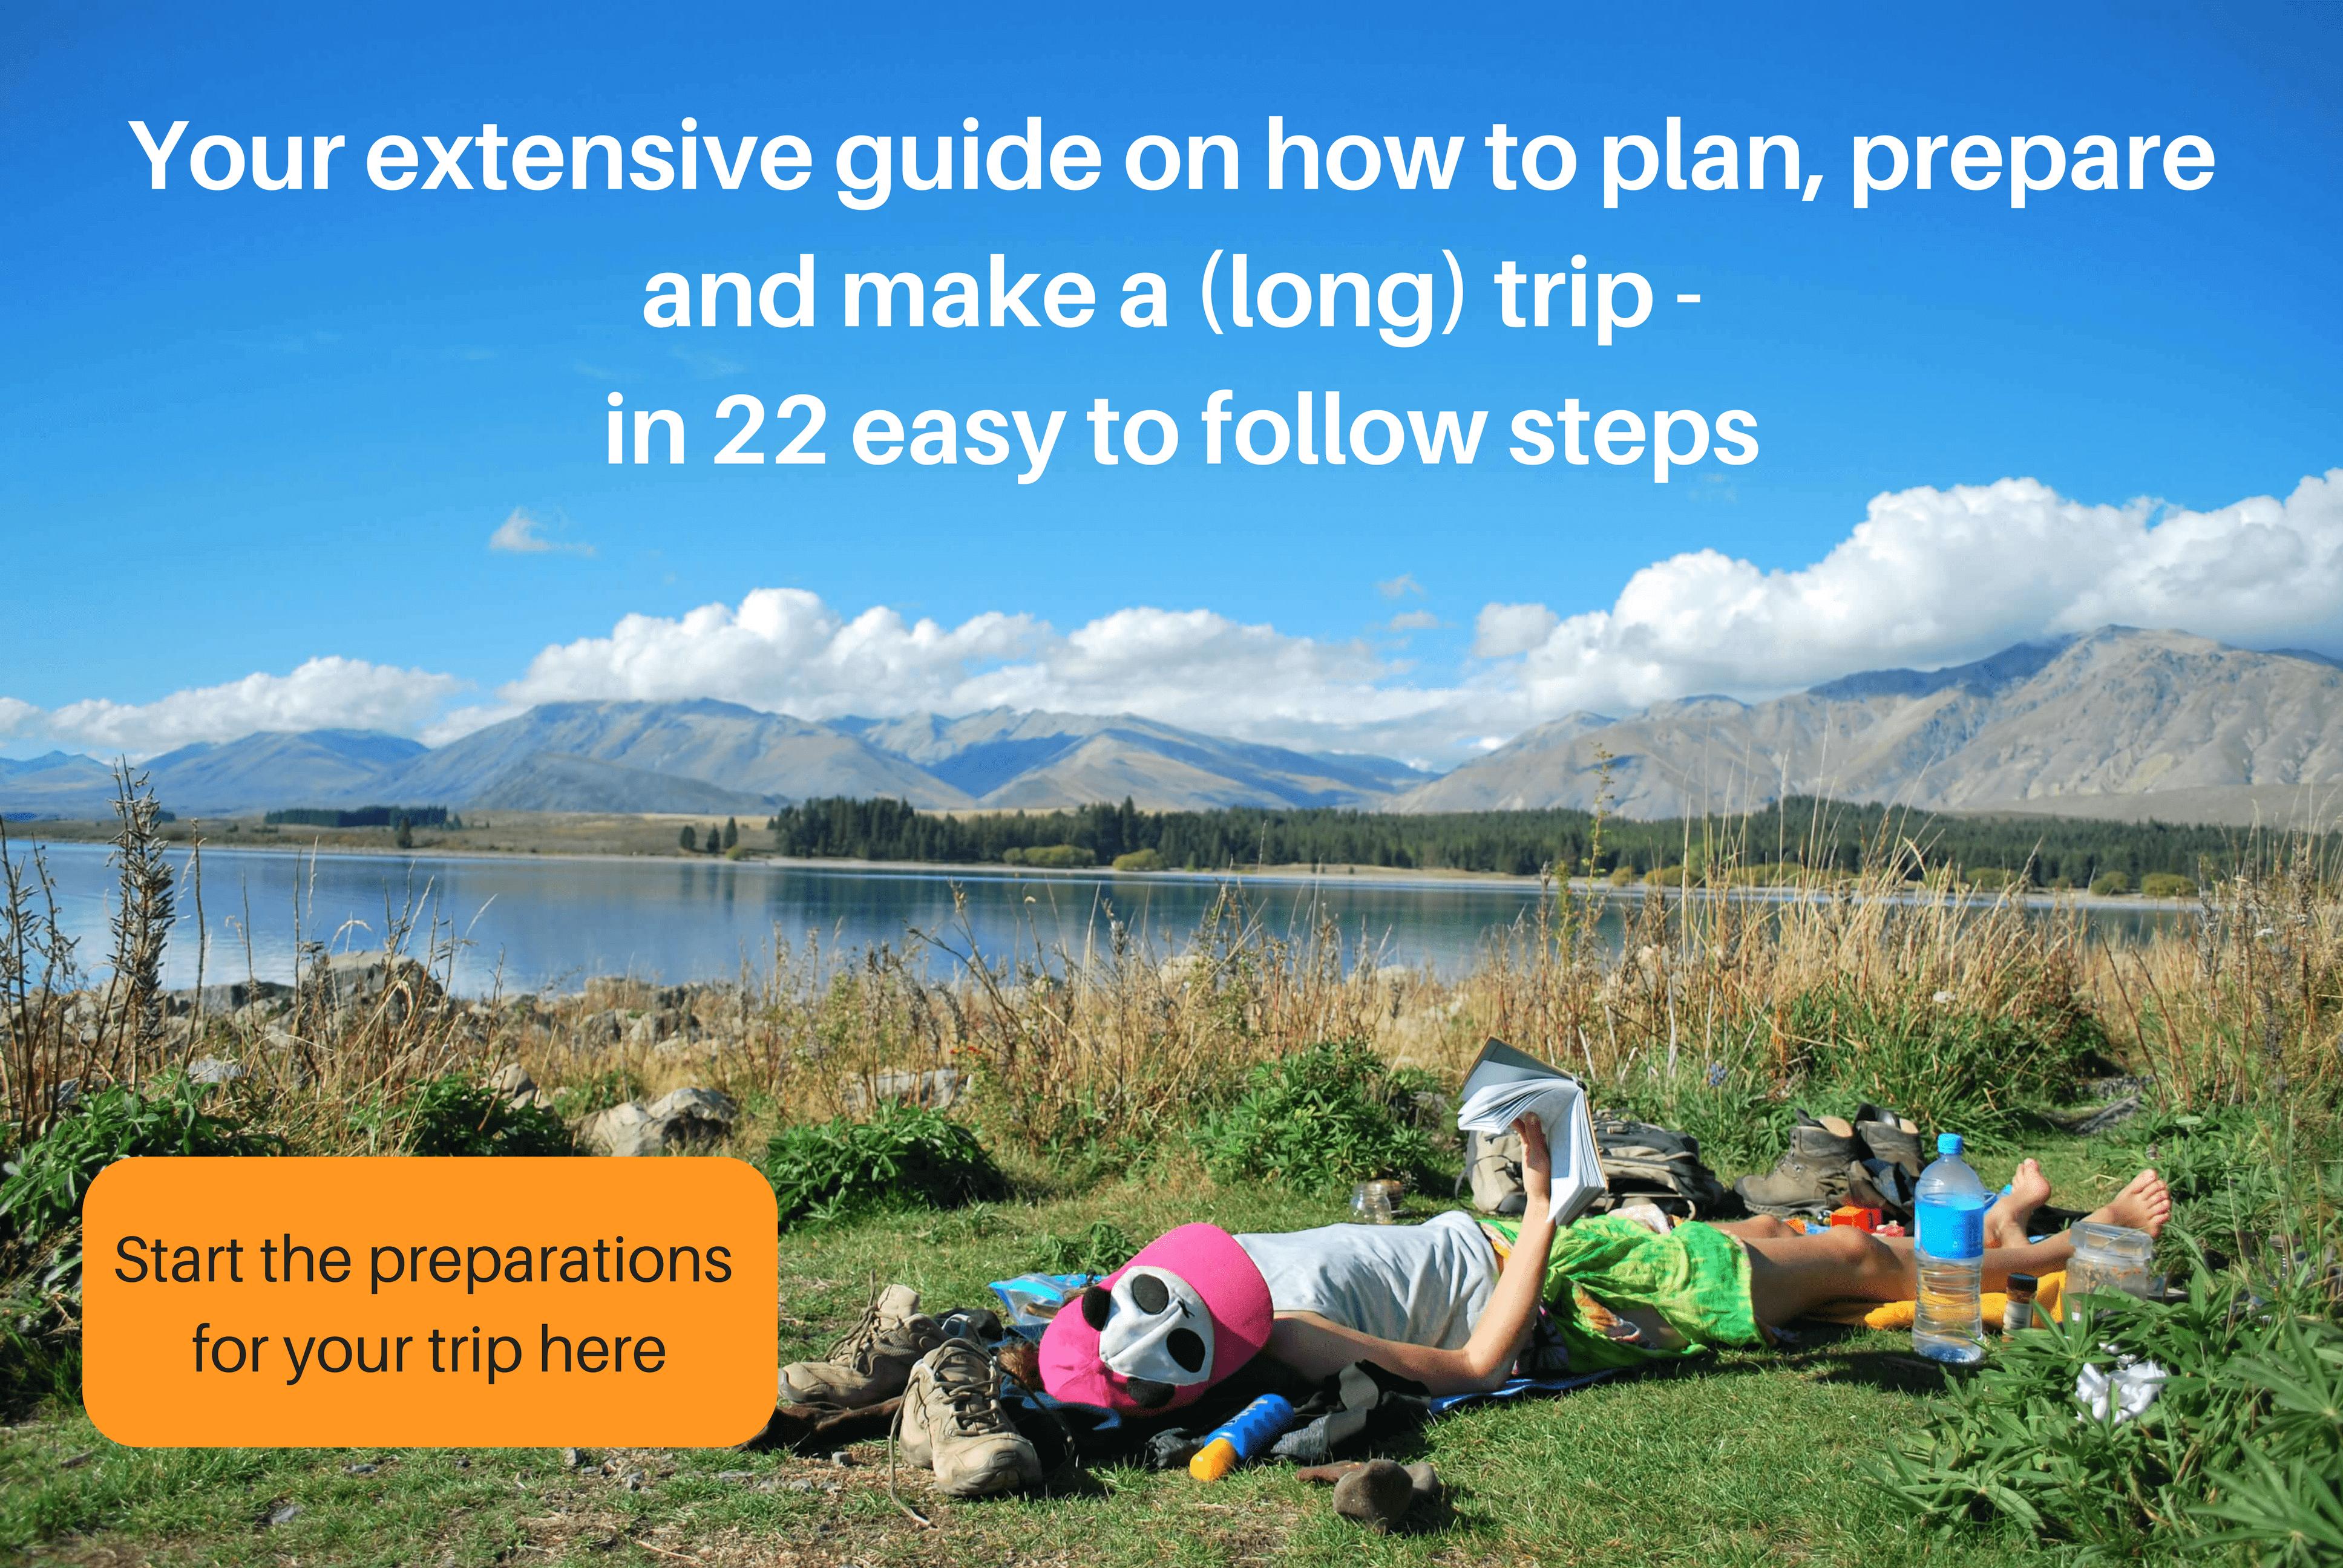 Trip preparation steps